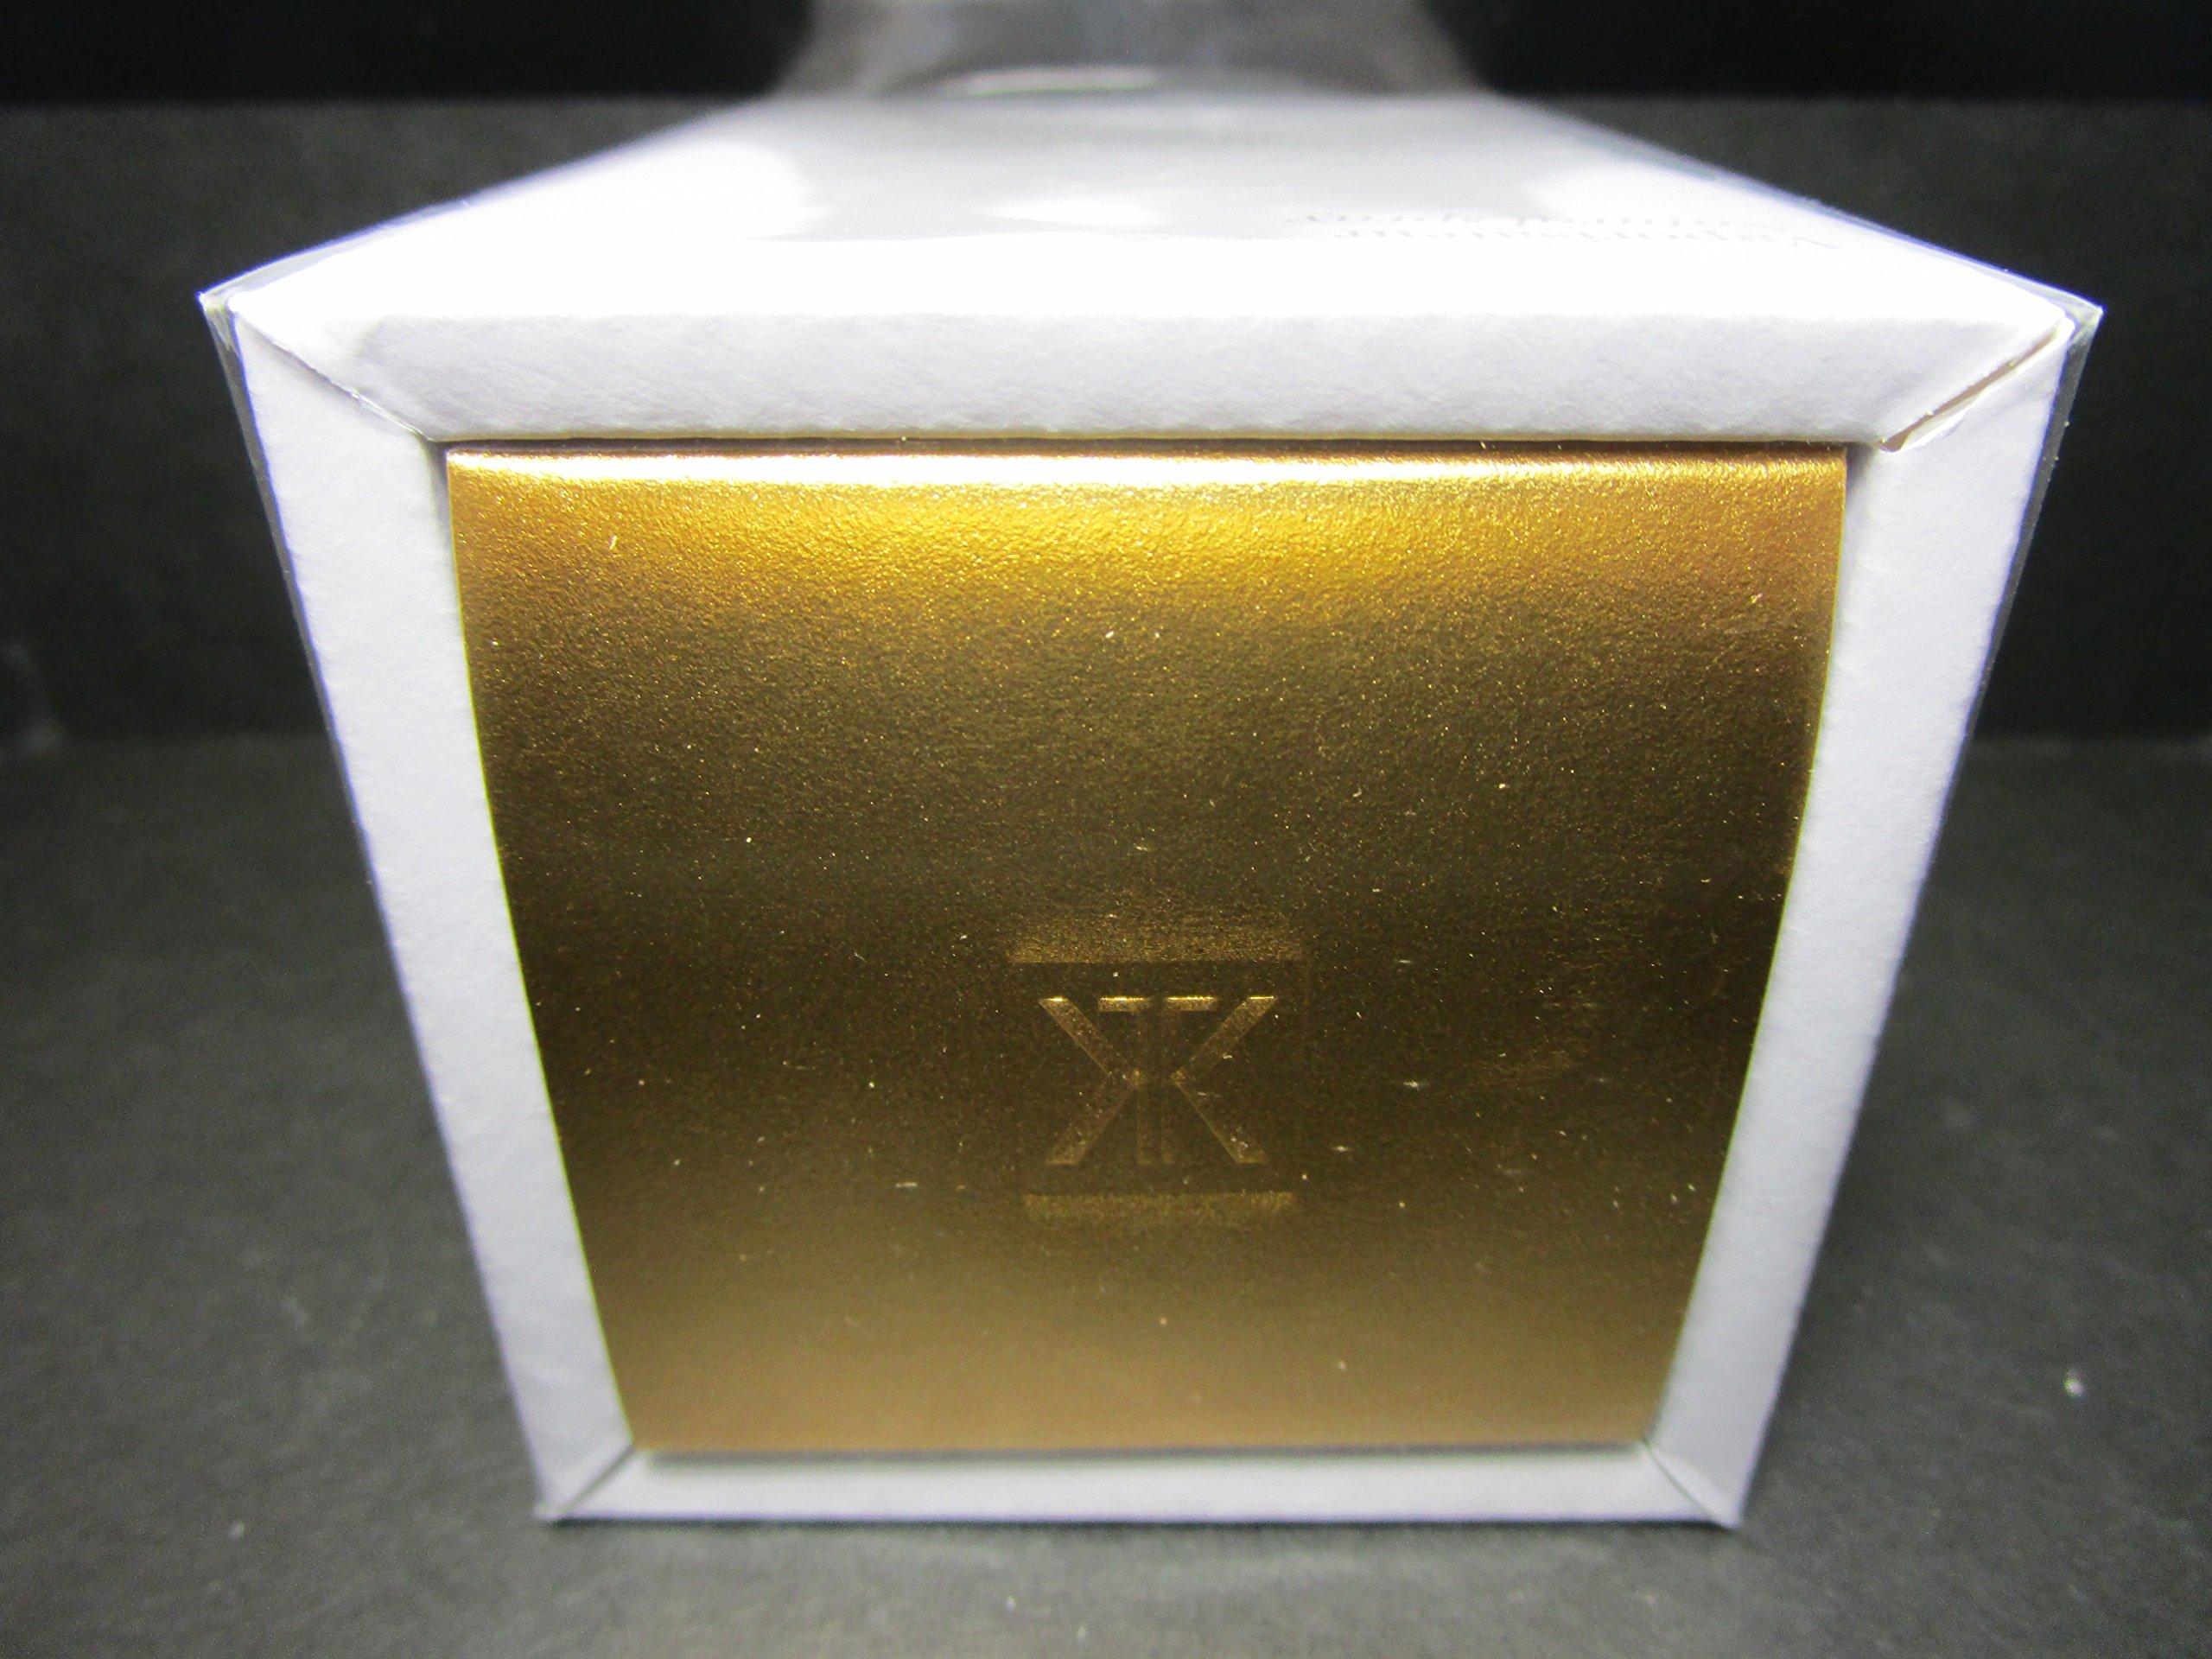 Maison Francis Kurkdjian Aqua Universalis Spray, 6.8 Ounce by Maison Francis Kurkdjian (Image #5)